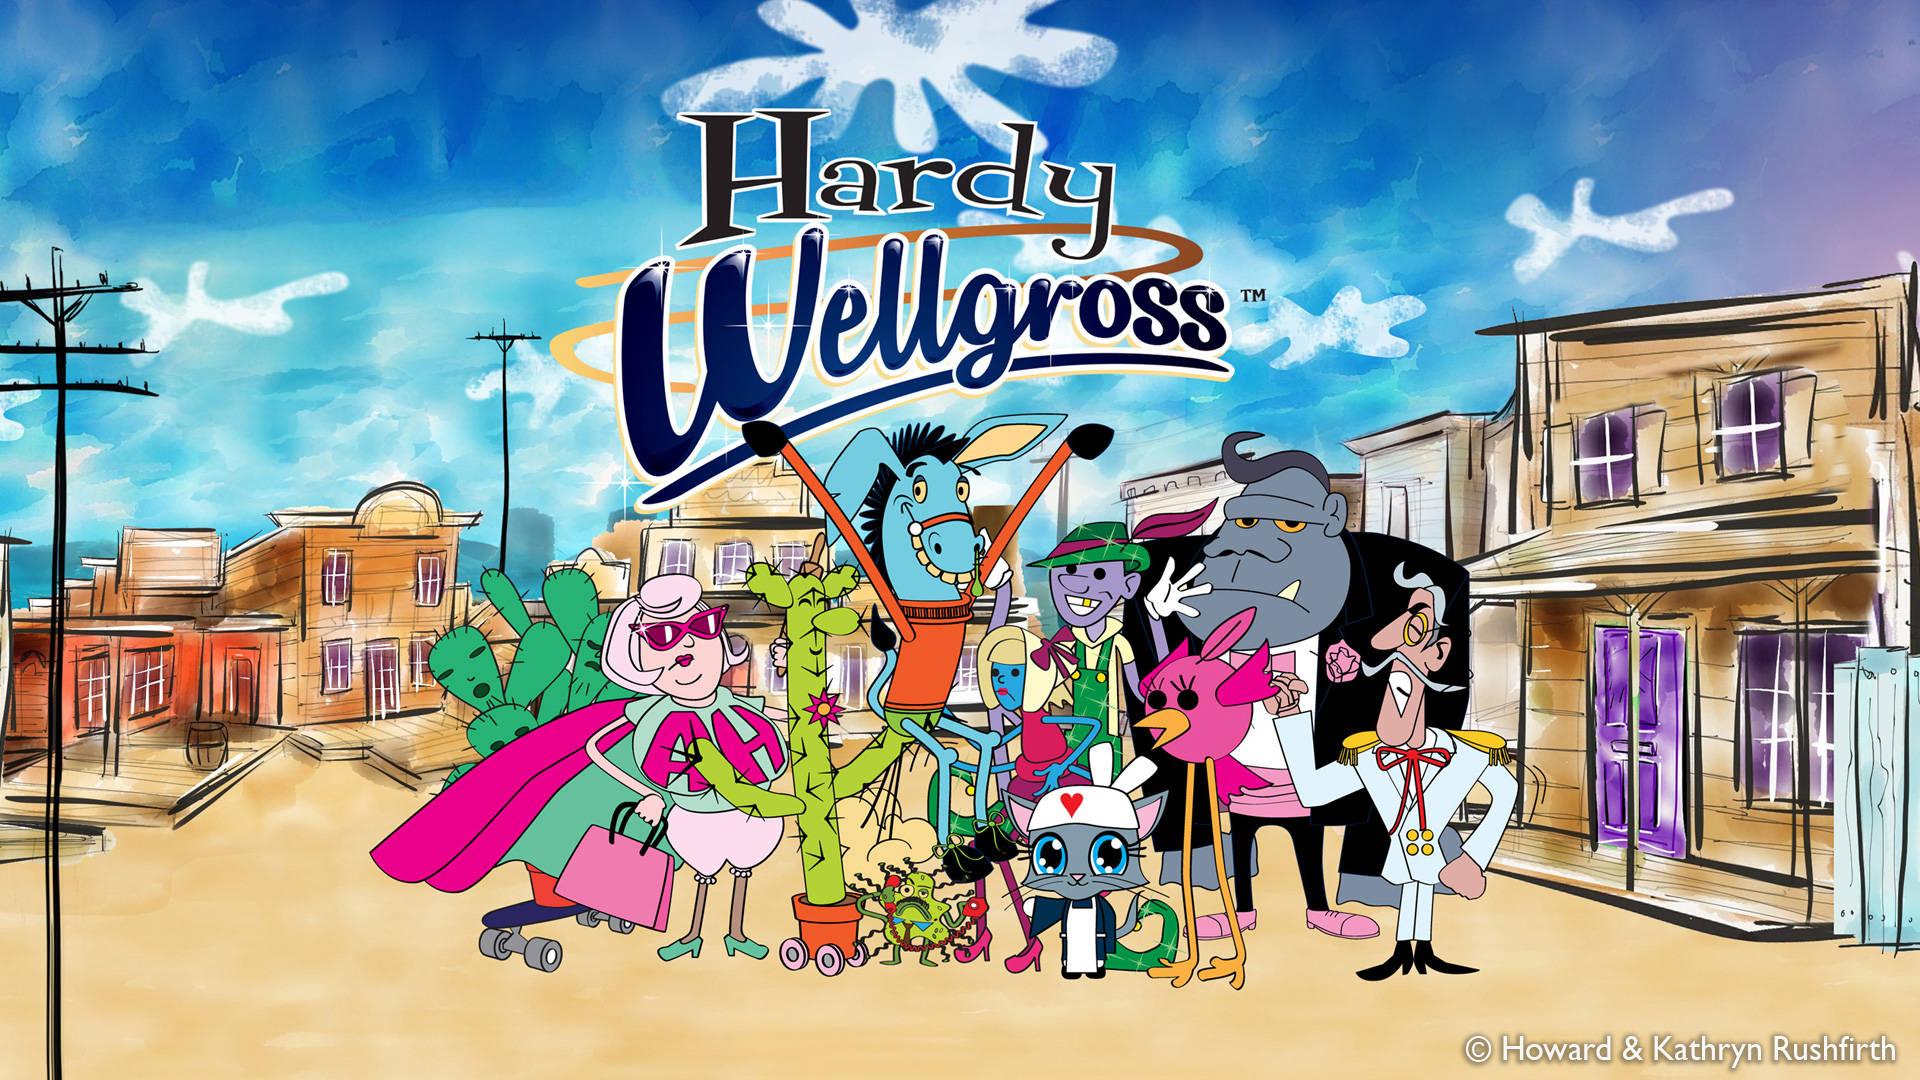 Hardy Wellgross title card.